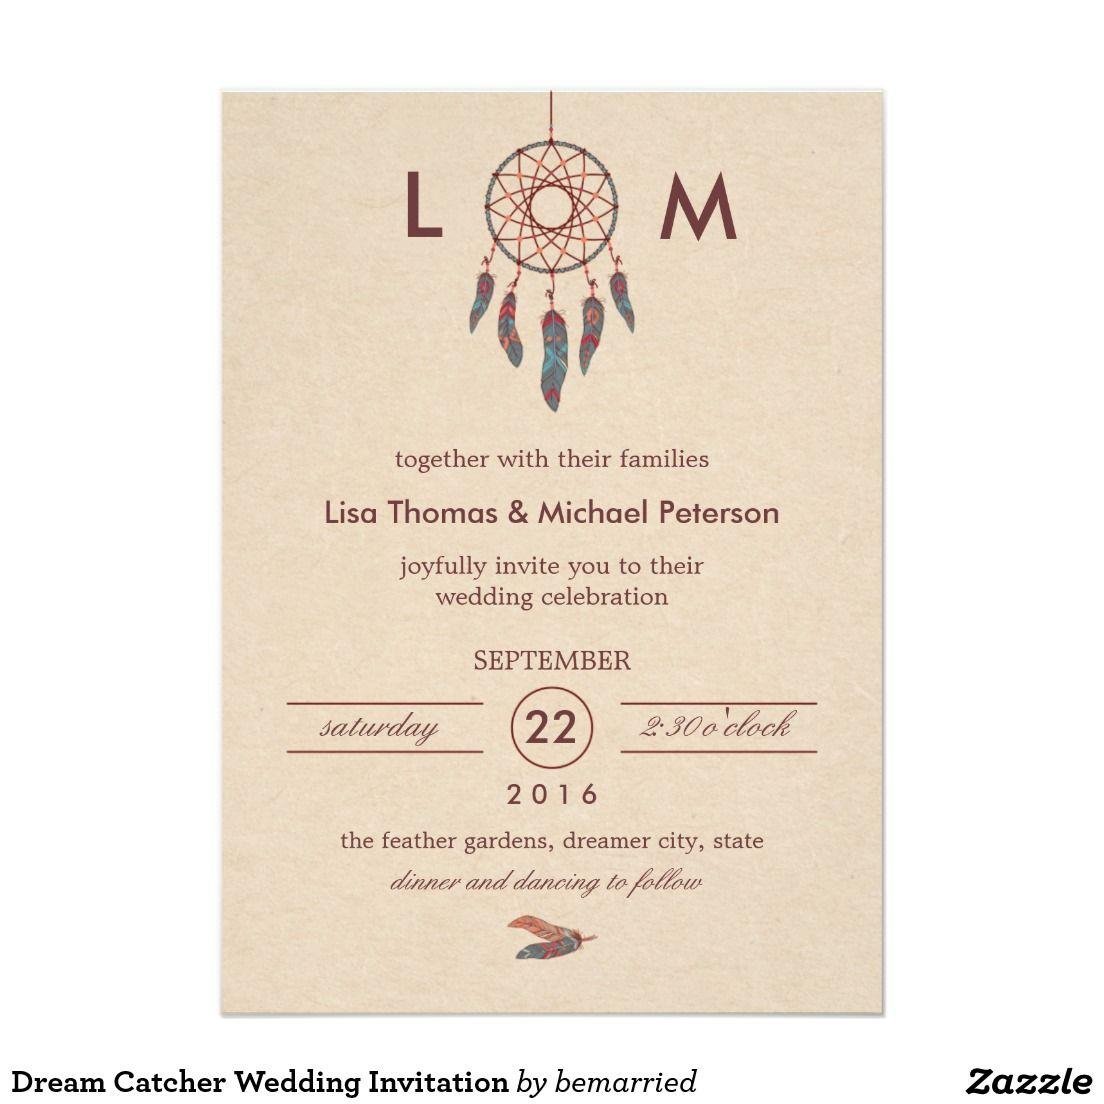 Dream Catcher Wedding Invitation